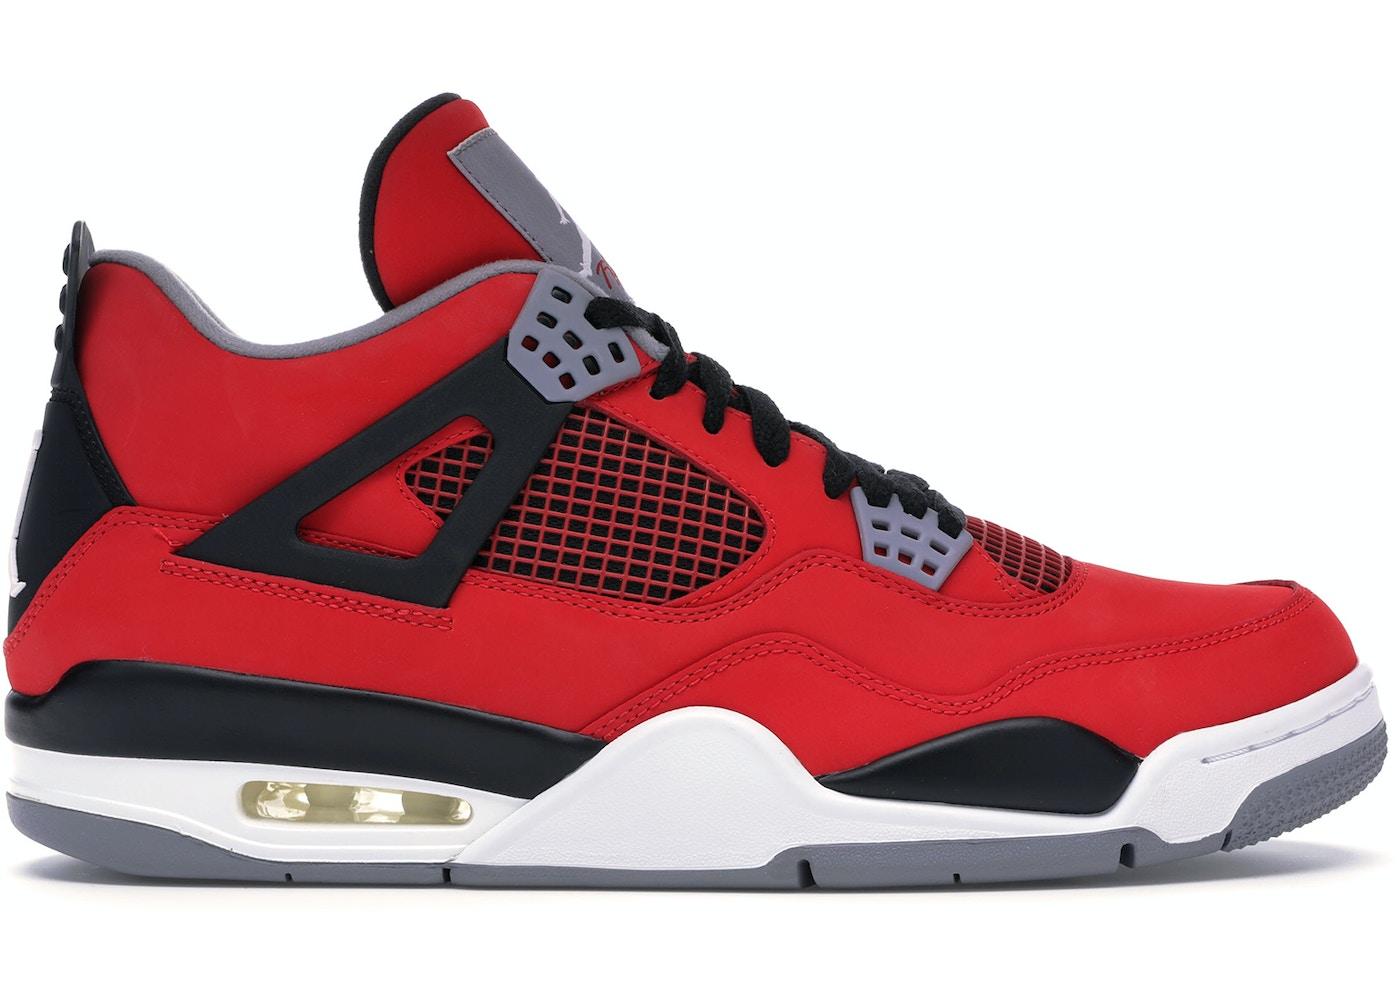 e901b6f332926d Jordan 4 Retro Toro Bravo - 308497-603